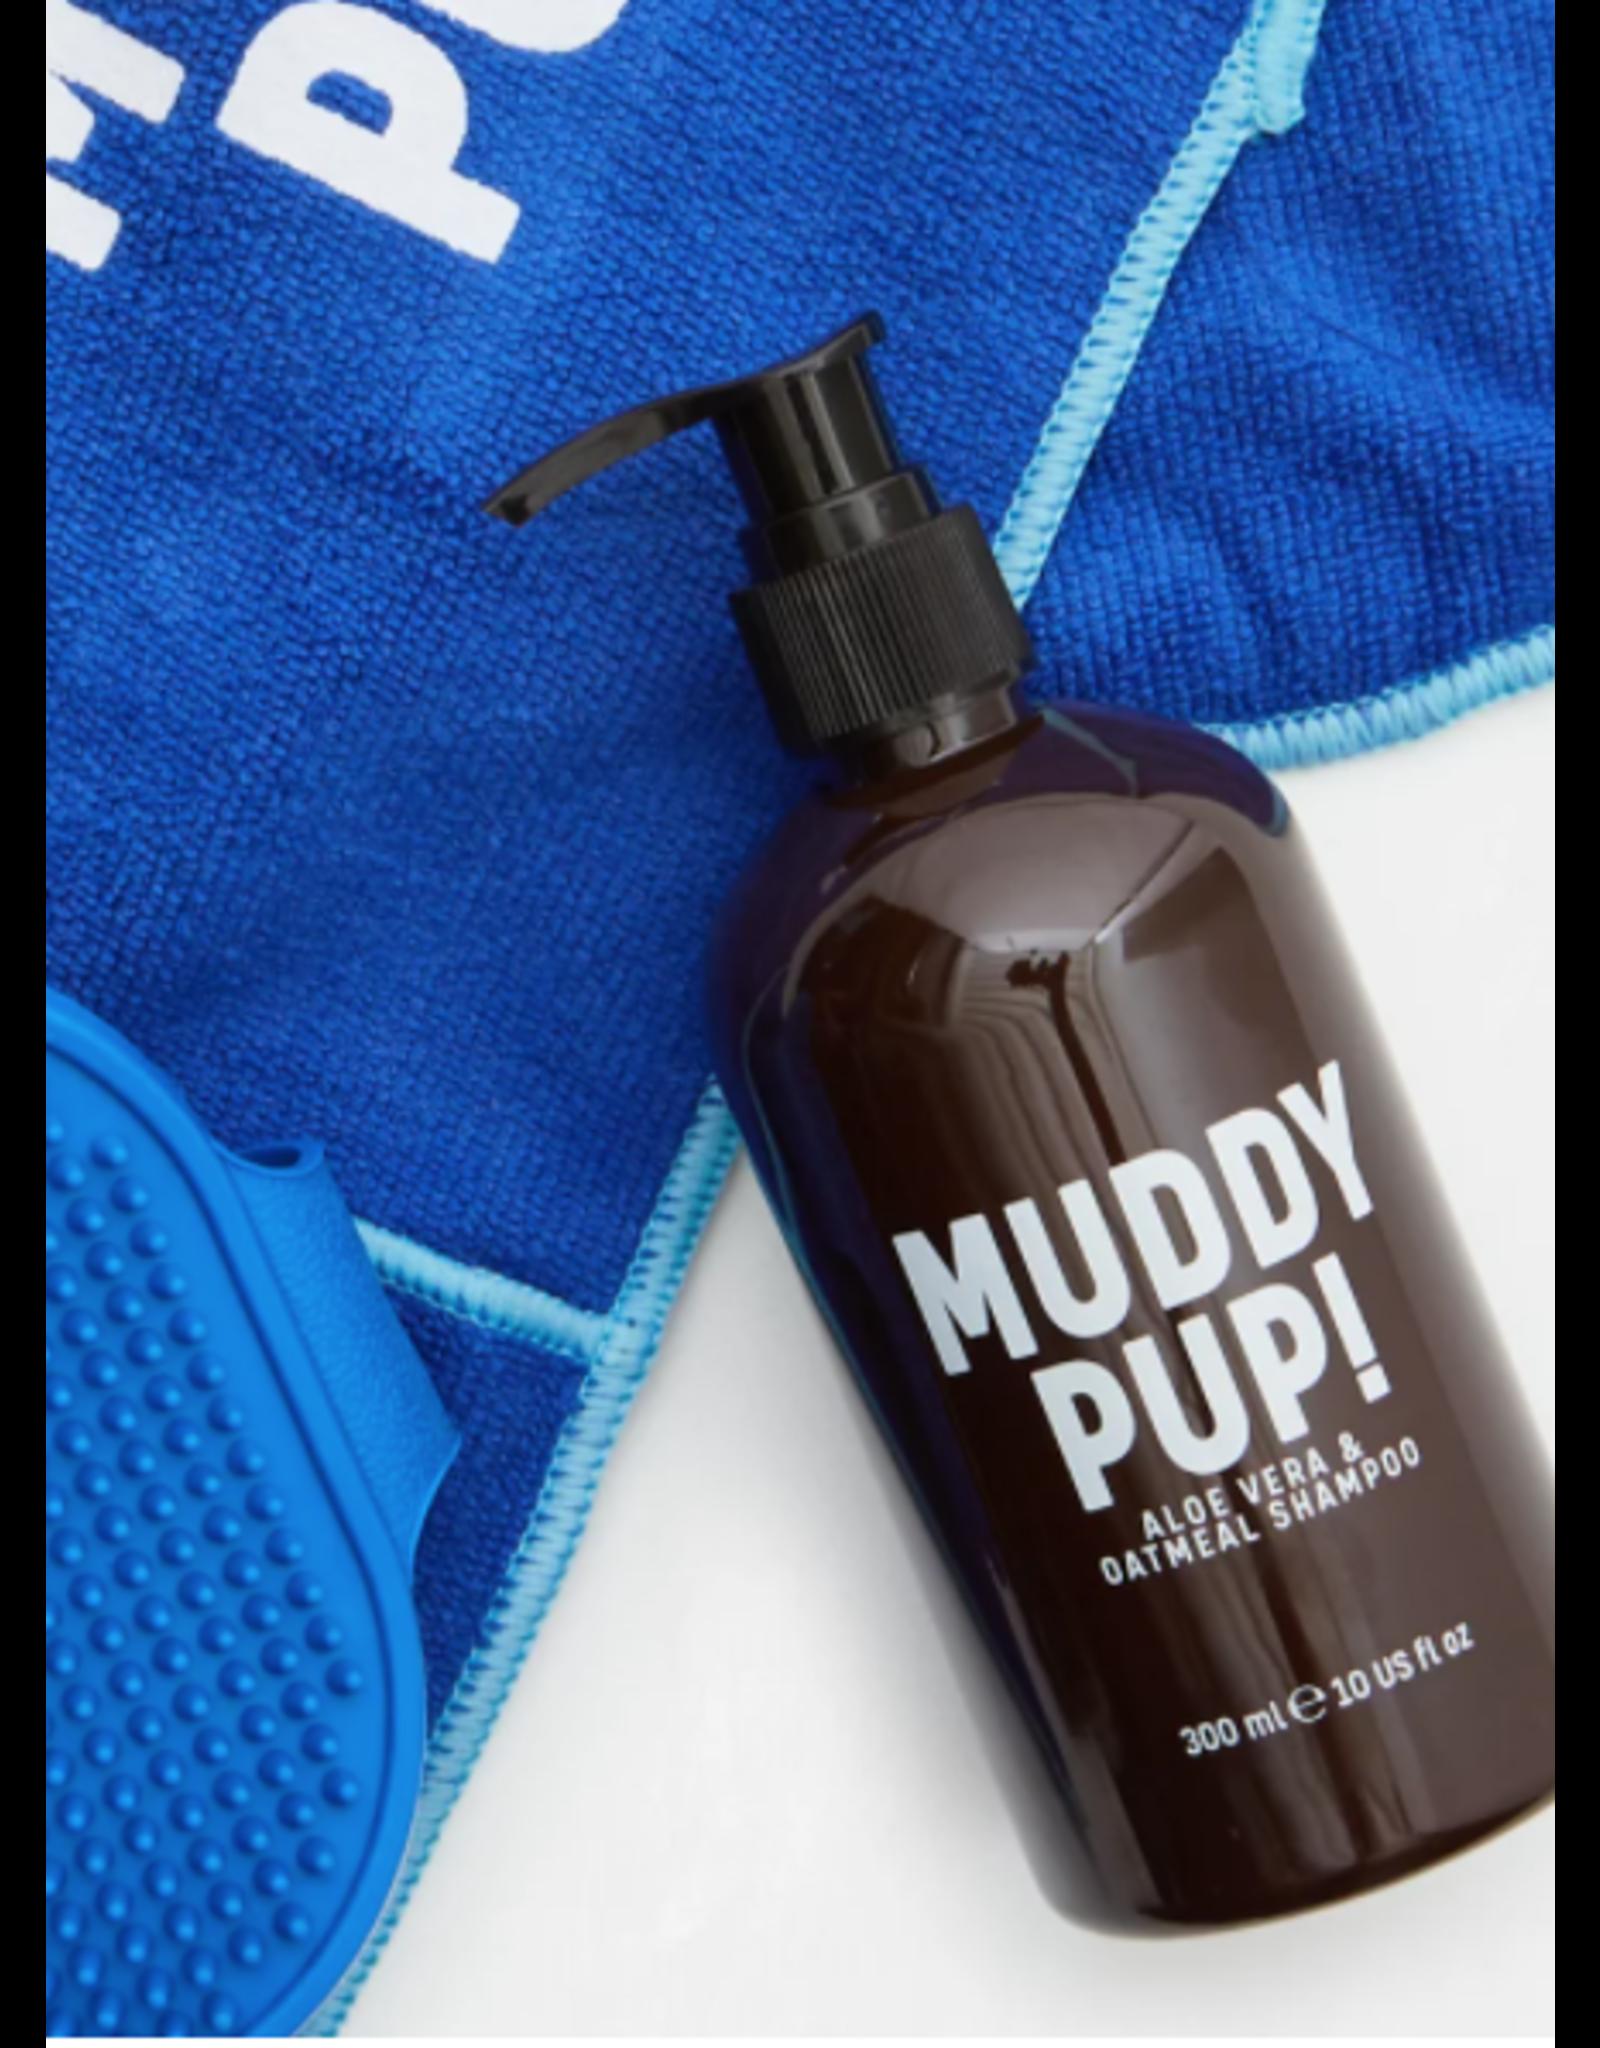 Muddy Puppy Shampoo